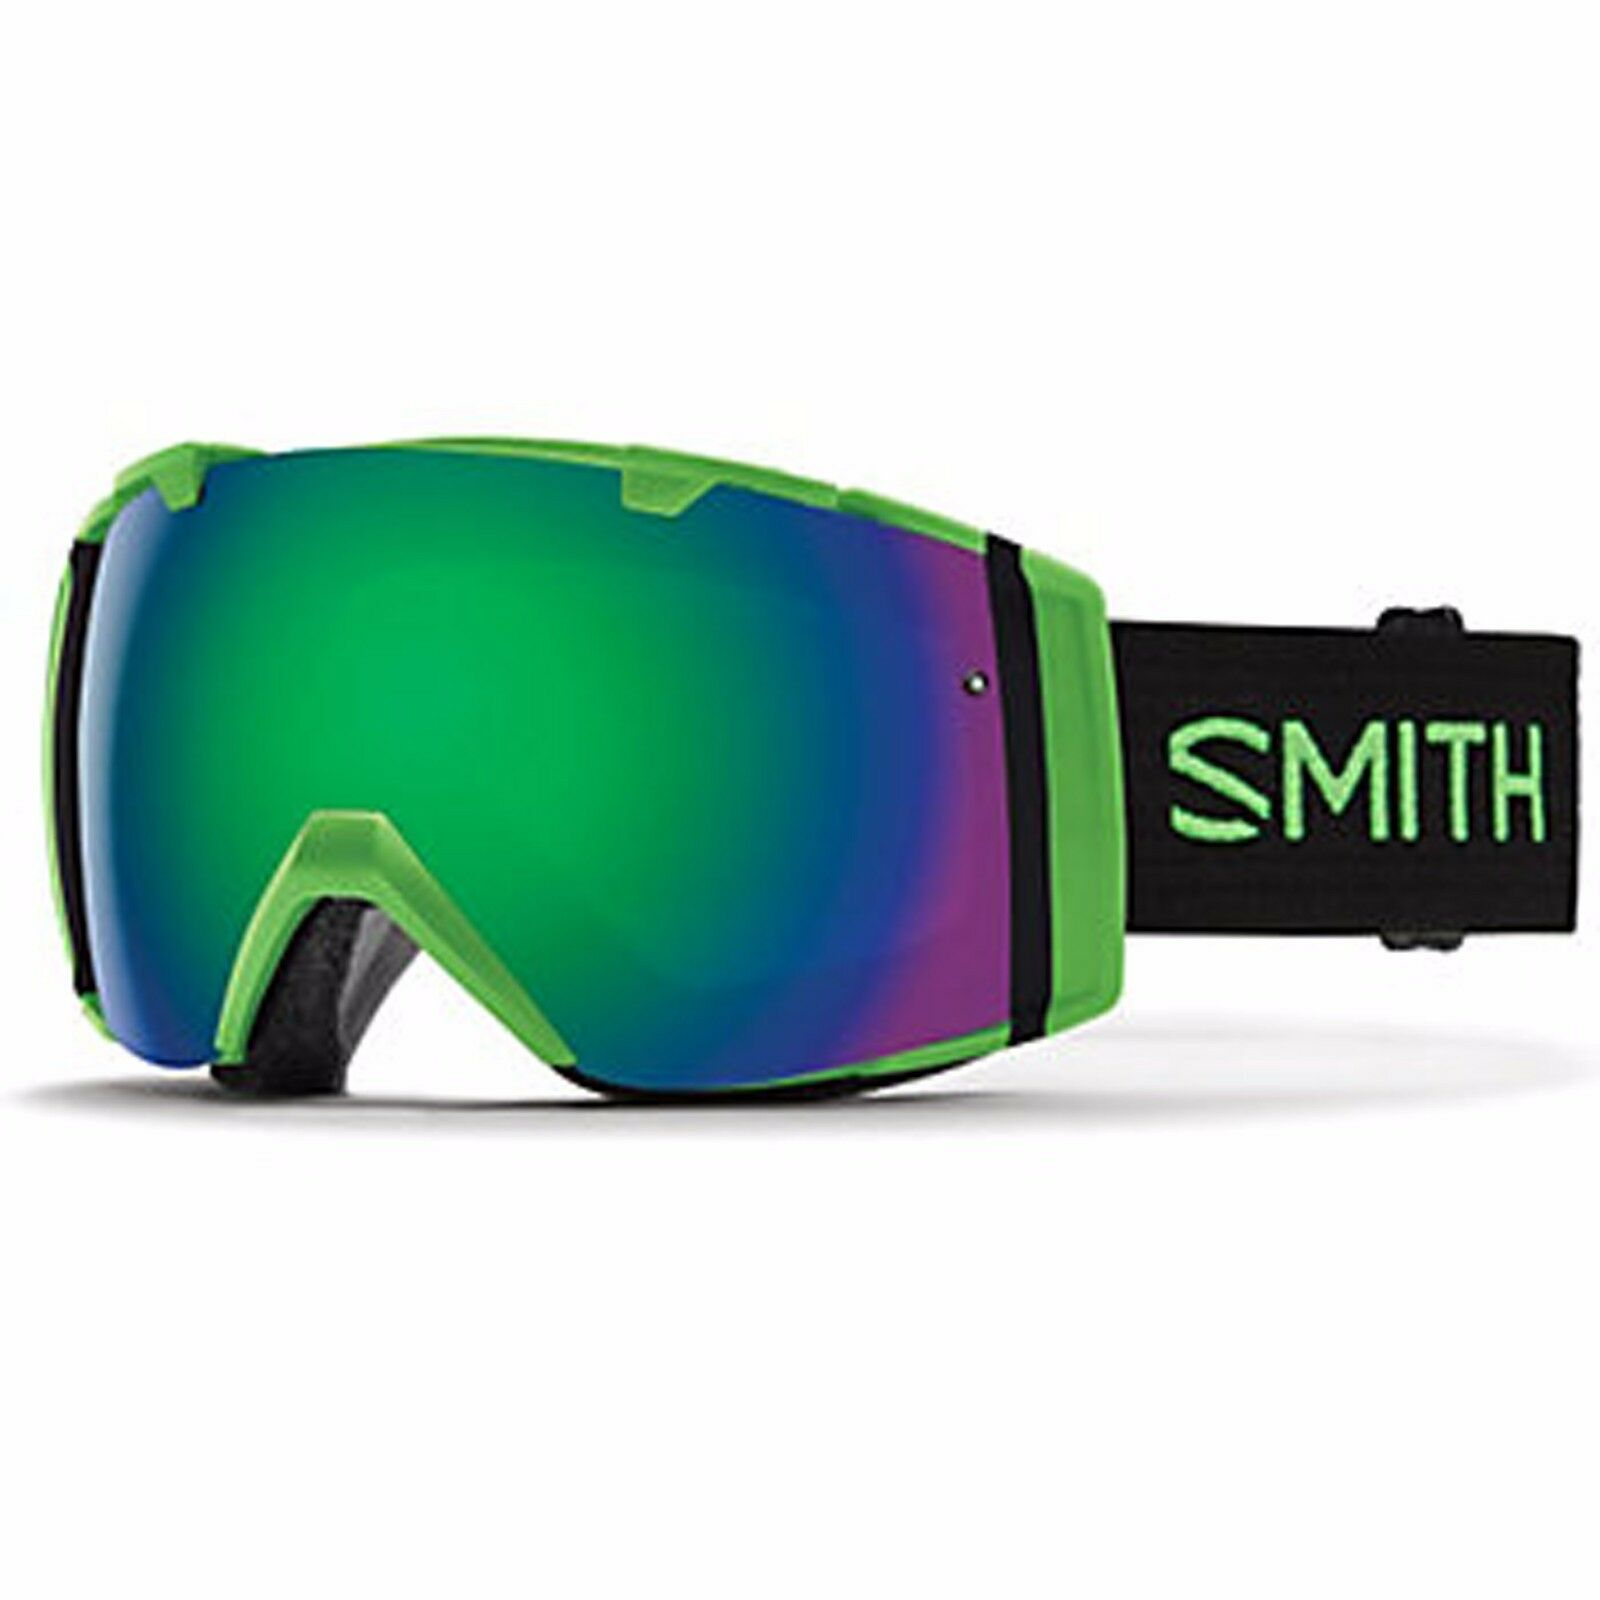 SMITH OPTICS SAMPLE II71SOL17 I O SKI SNOWBOARD GOGGLE SOLAR IGNITOR MIRROR